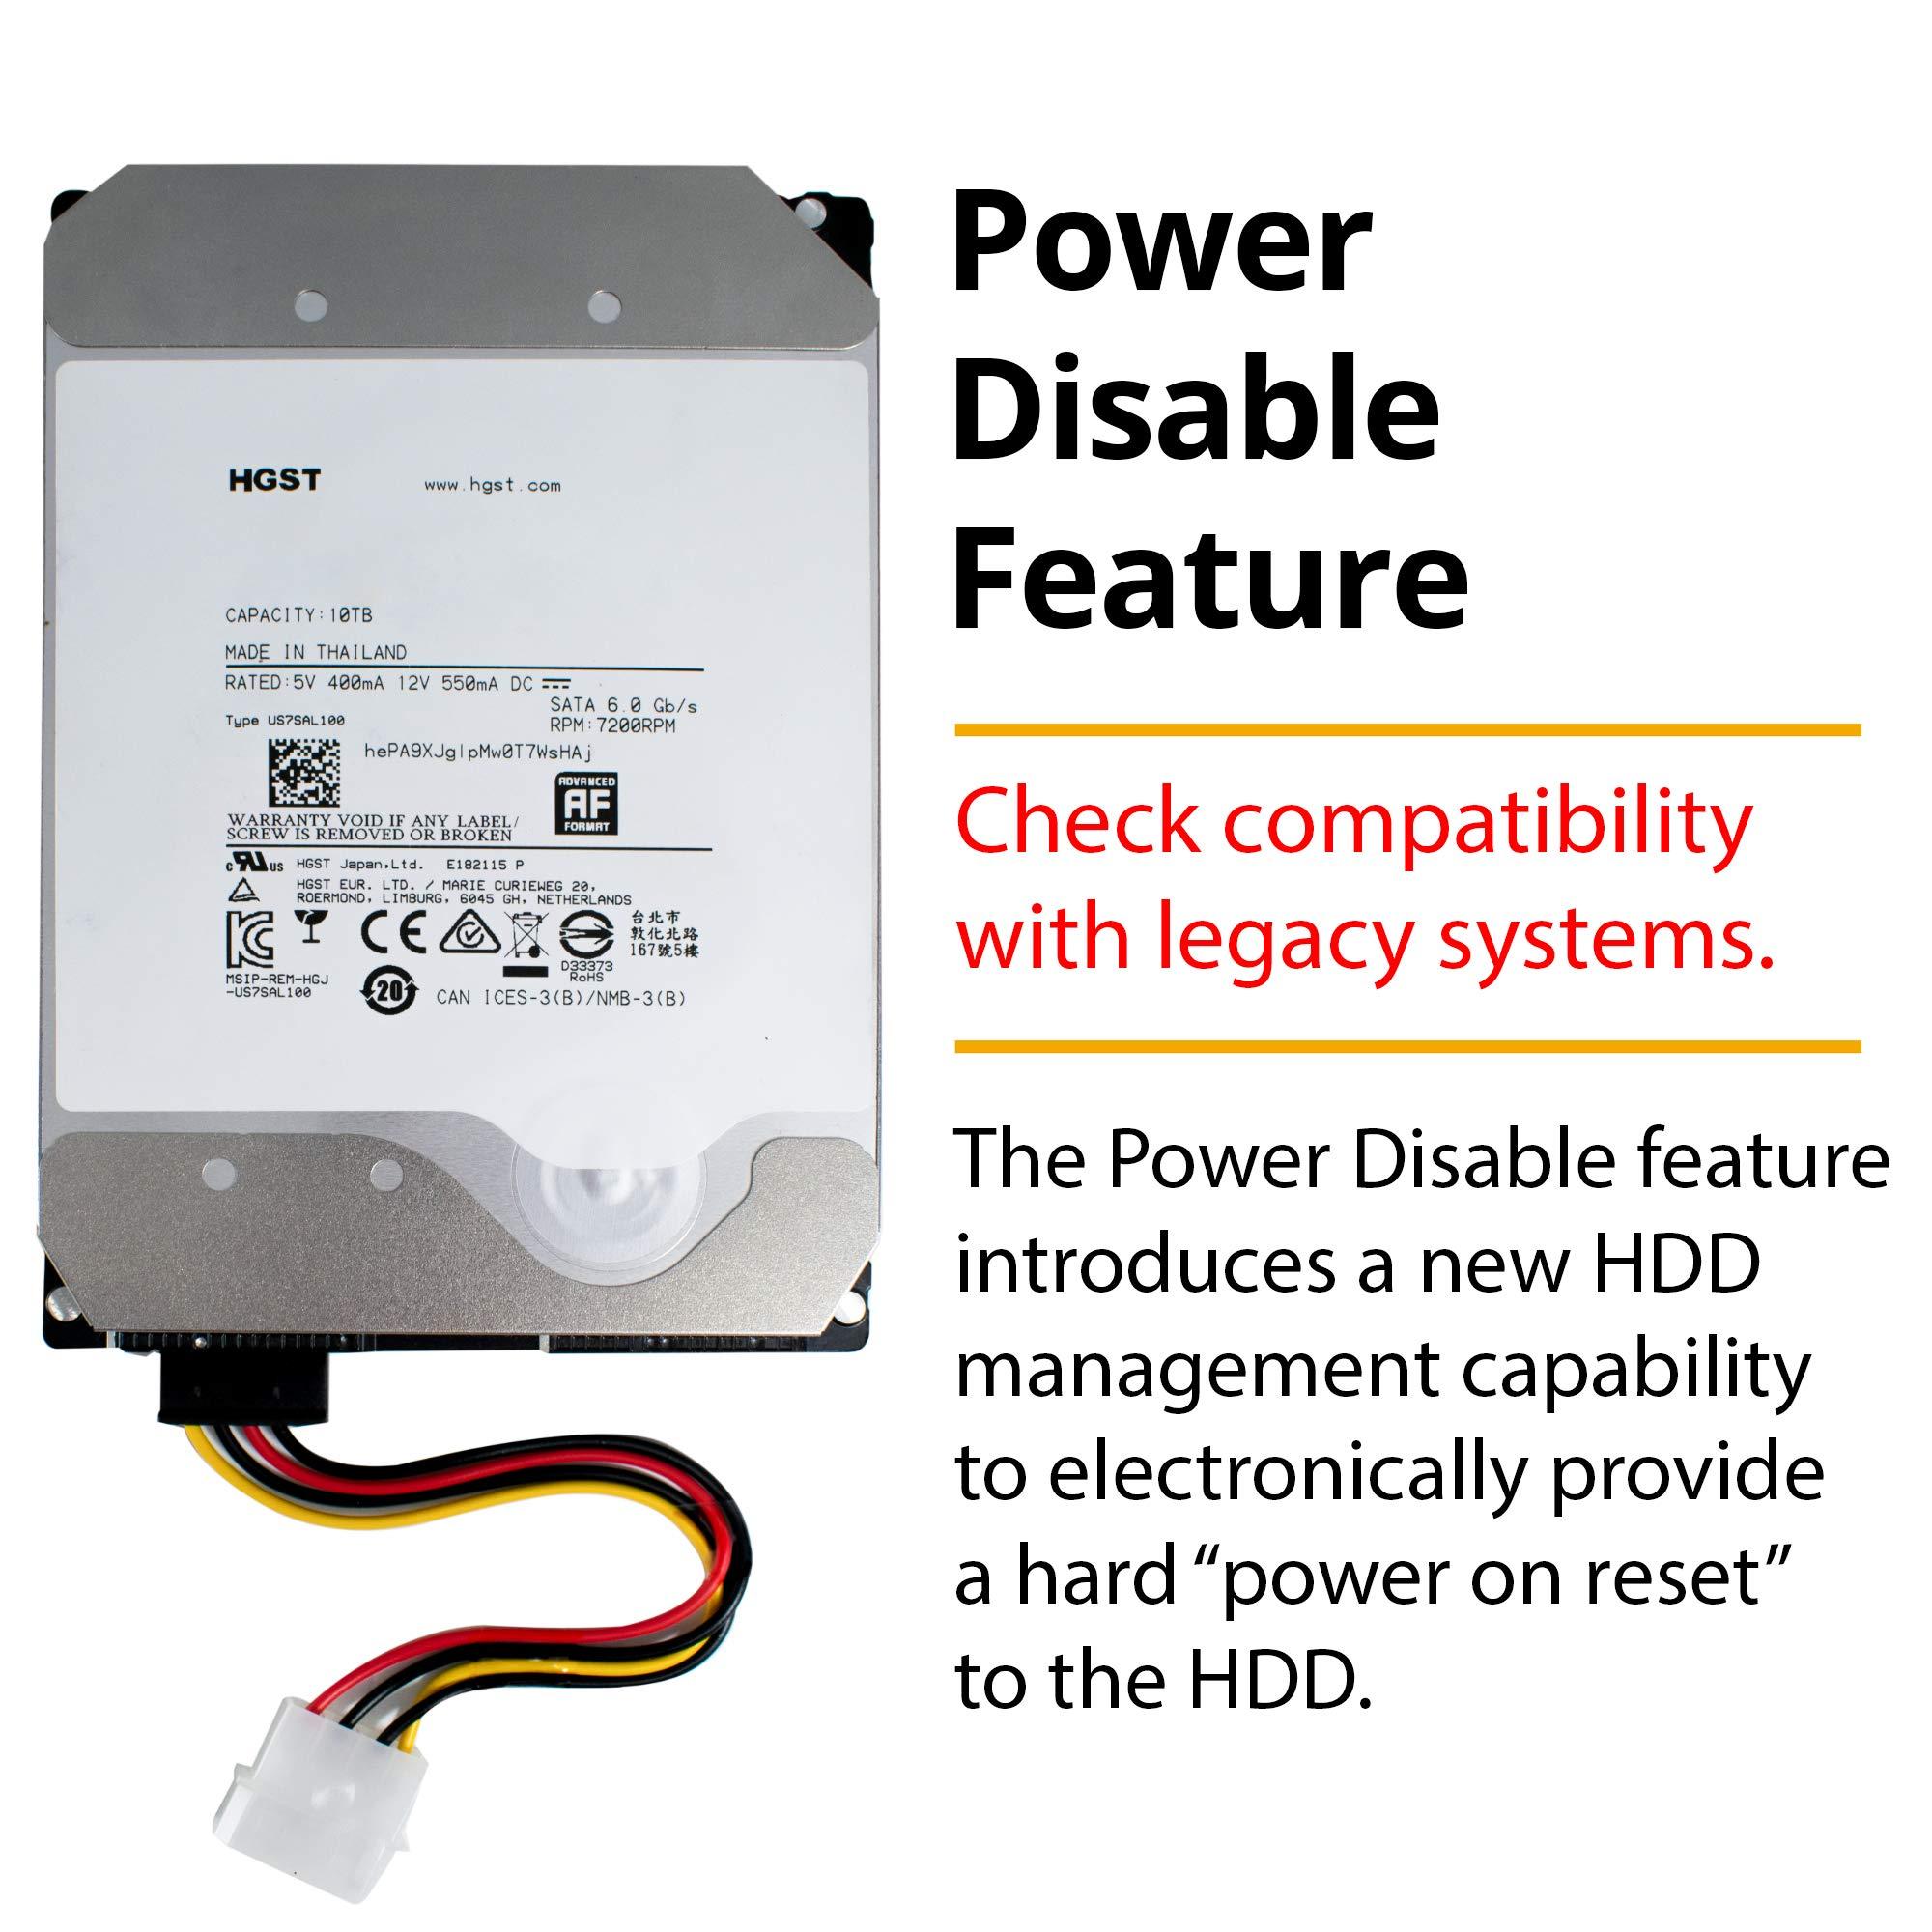 HGST Ultrastar He10 | HUH721010ALE600| 0F27452 | 512e | 10TB SATA 6.0Gb/s 7200 RPM 256MB Cache 3.5in | Enterprise Hard Drive HDD,  (Renewed) by HGST (Image #2)